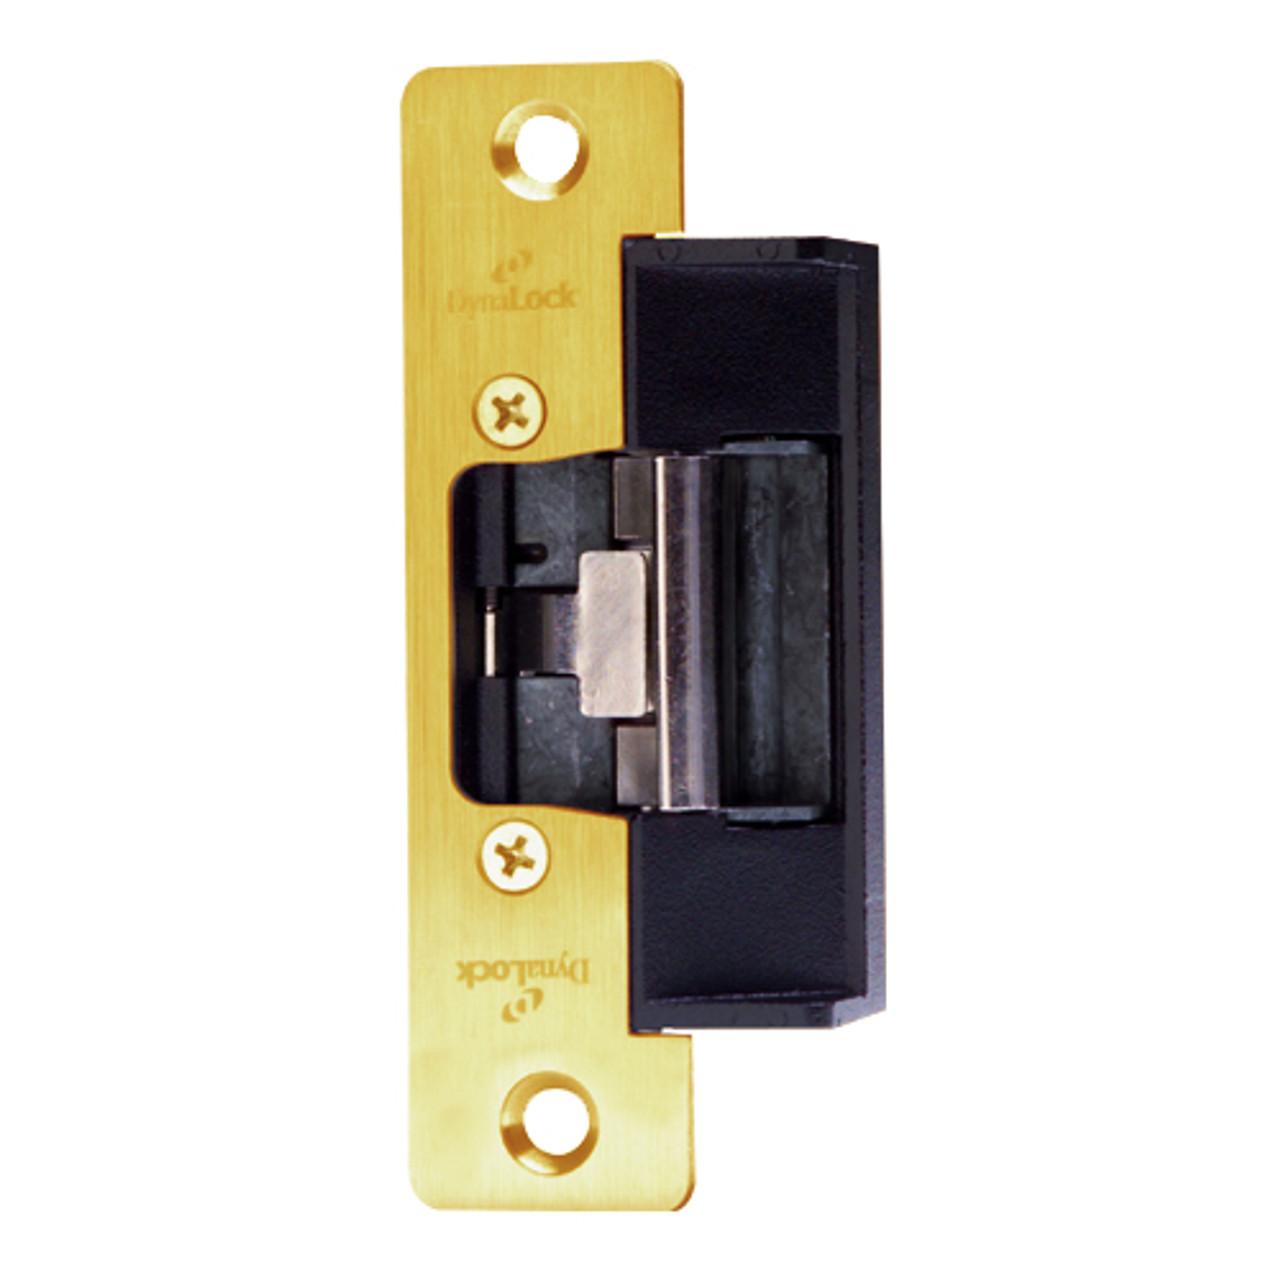 1604S-US3 DynaLock 1600 Series Electric Strike for Standard Profile in Bright Brass